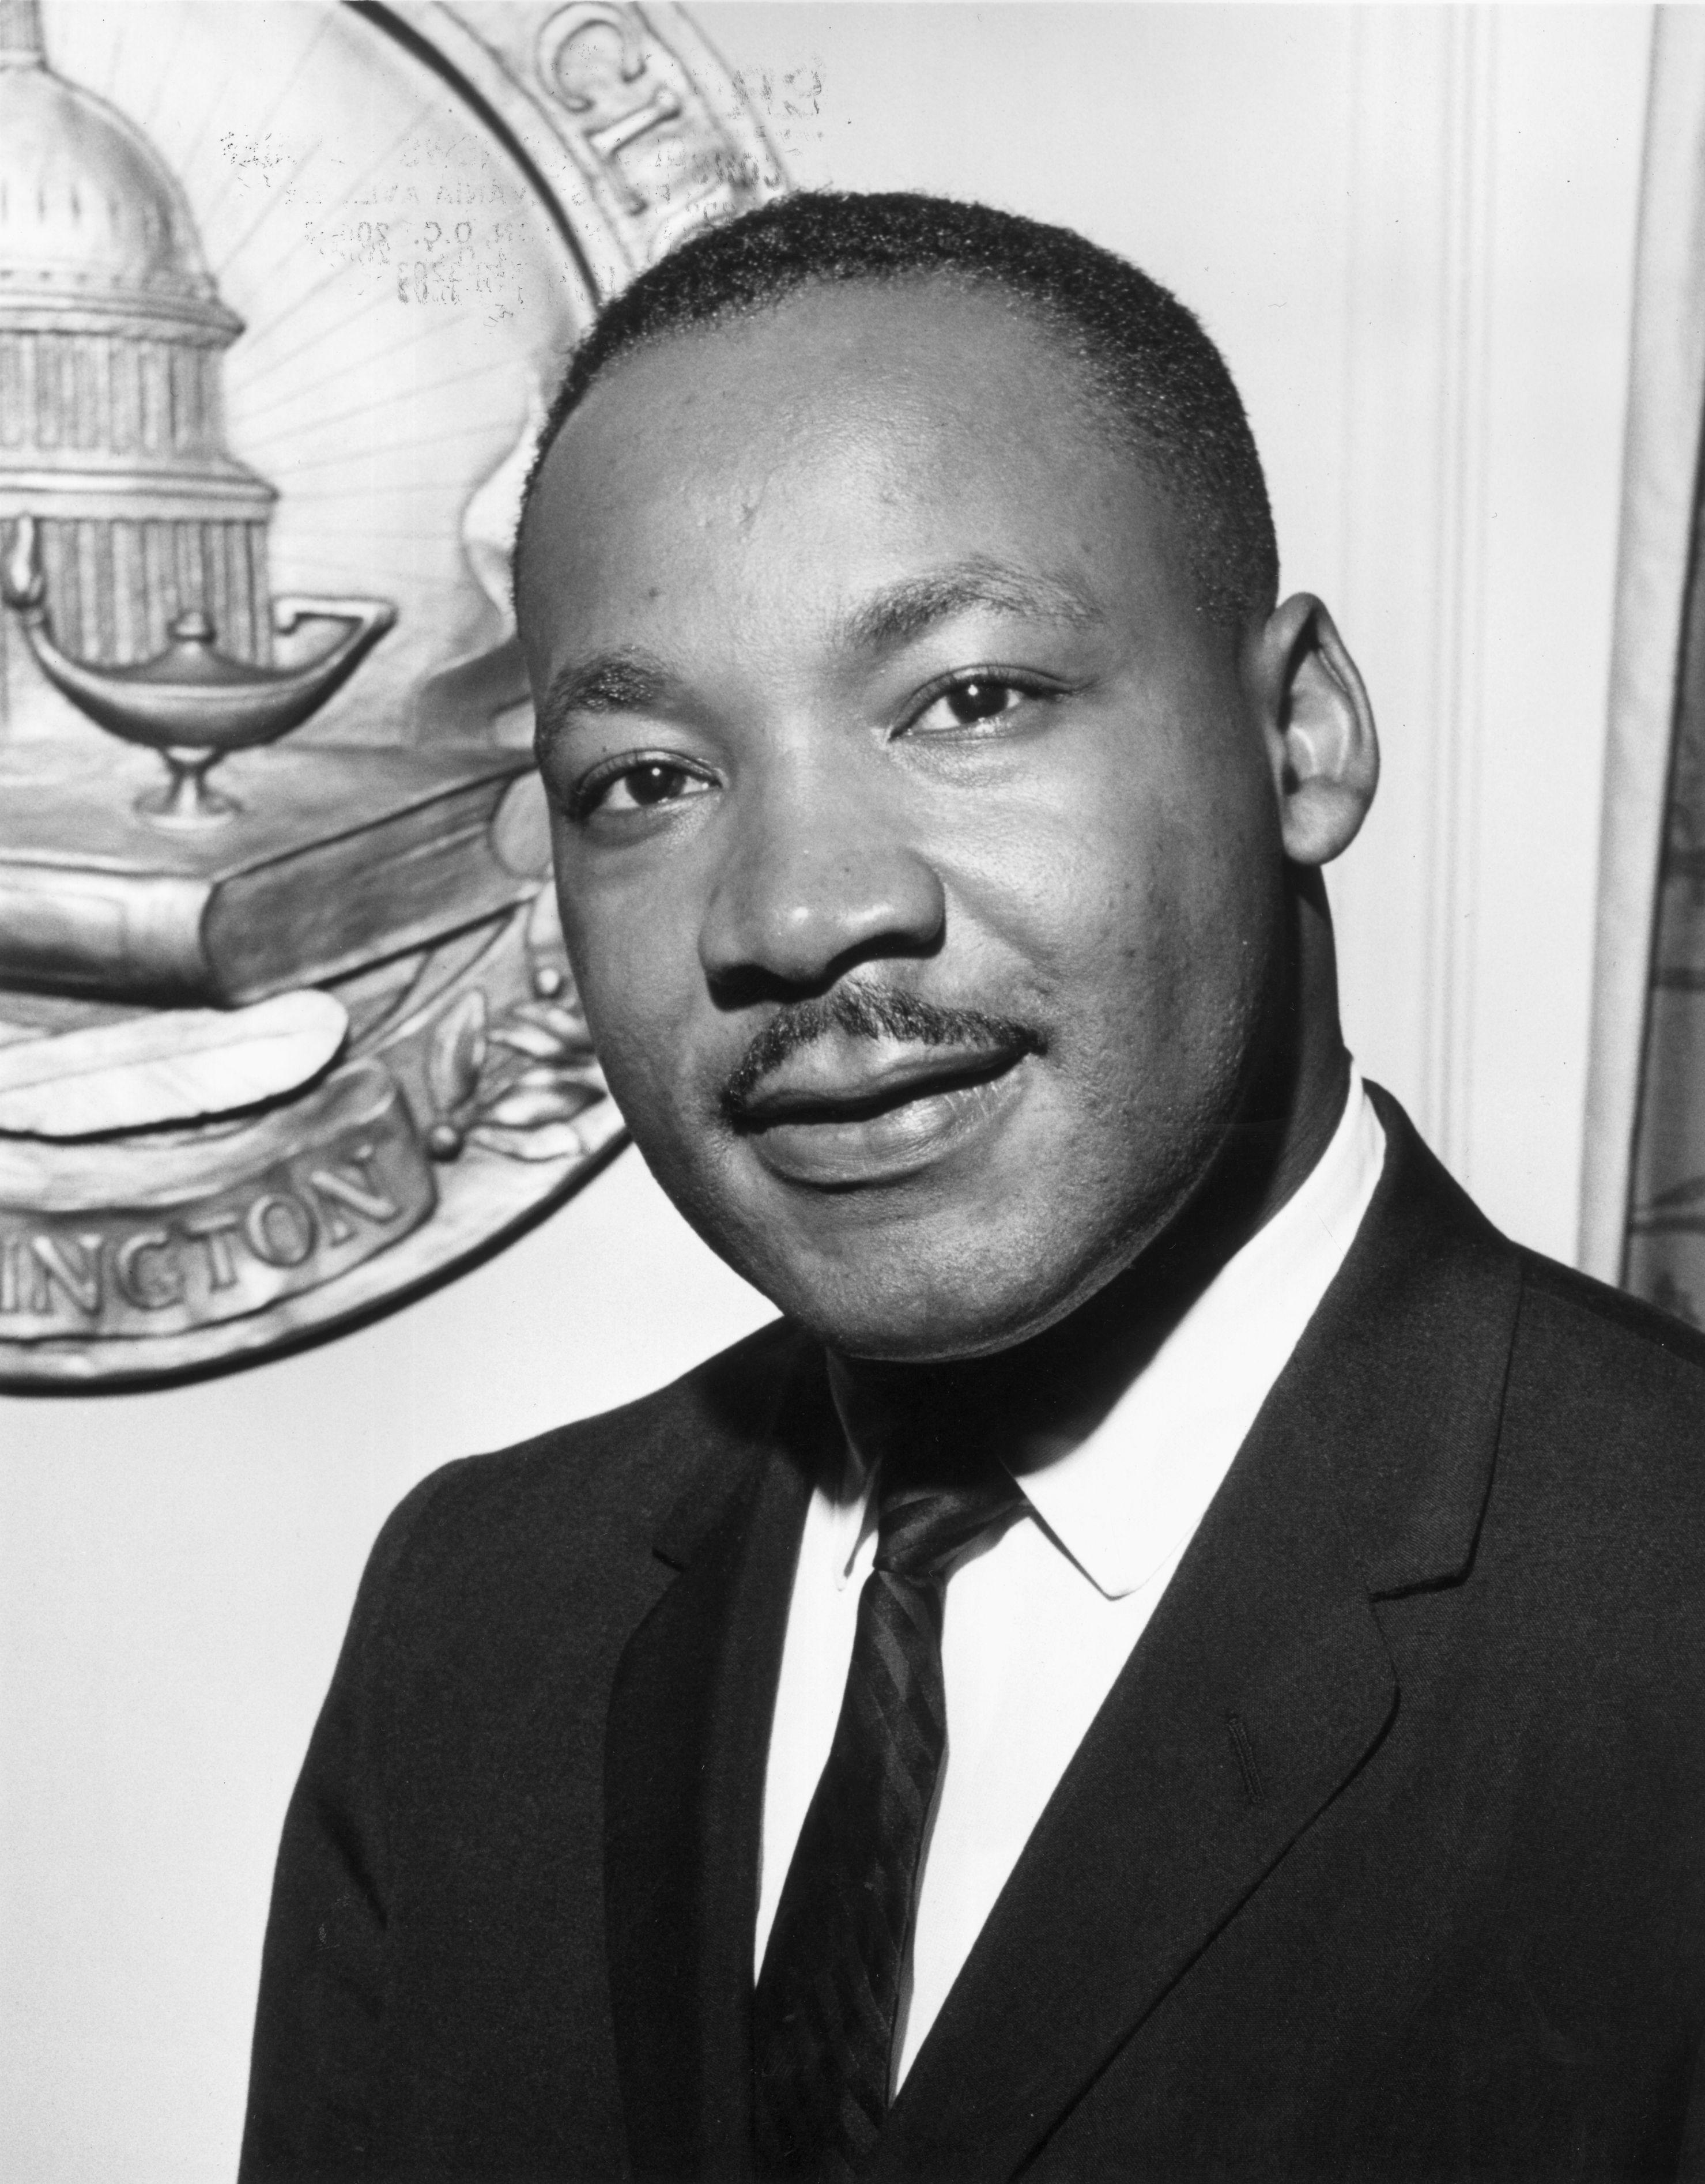 Dr Martin Luther King Jr S Life And Accomplishments